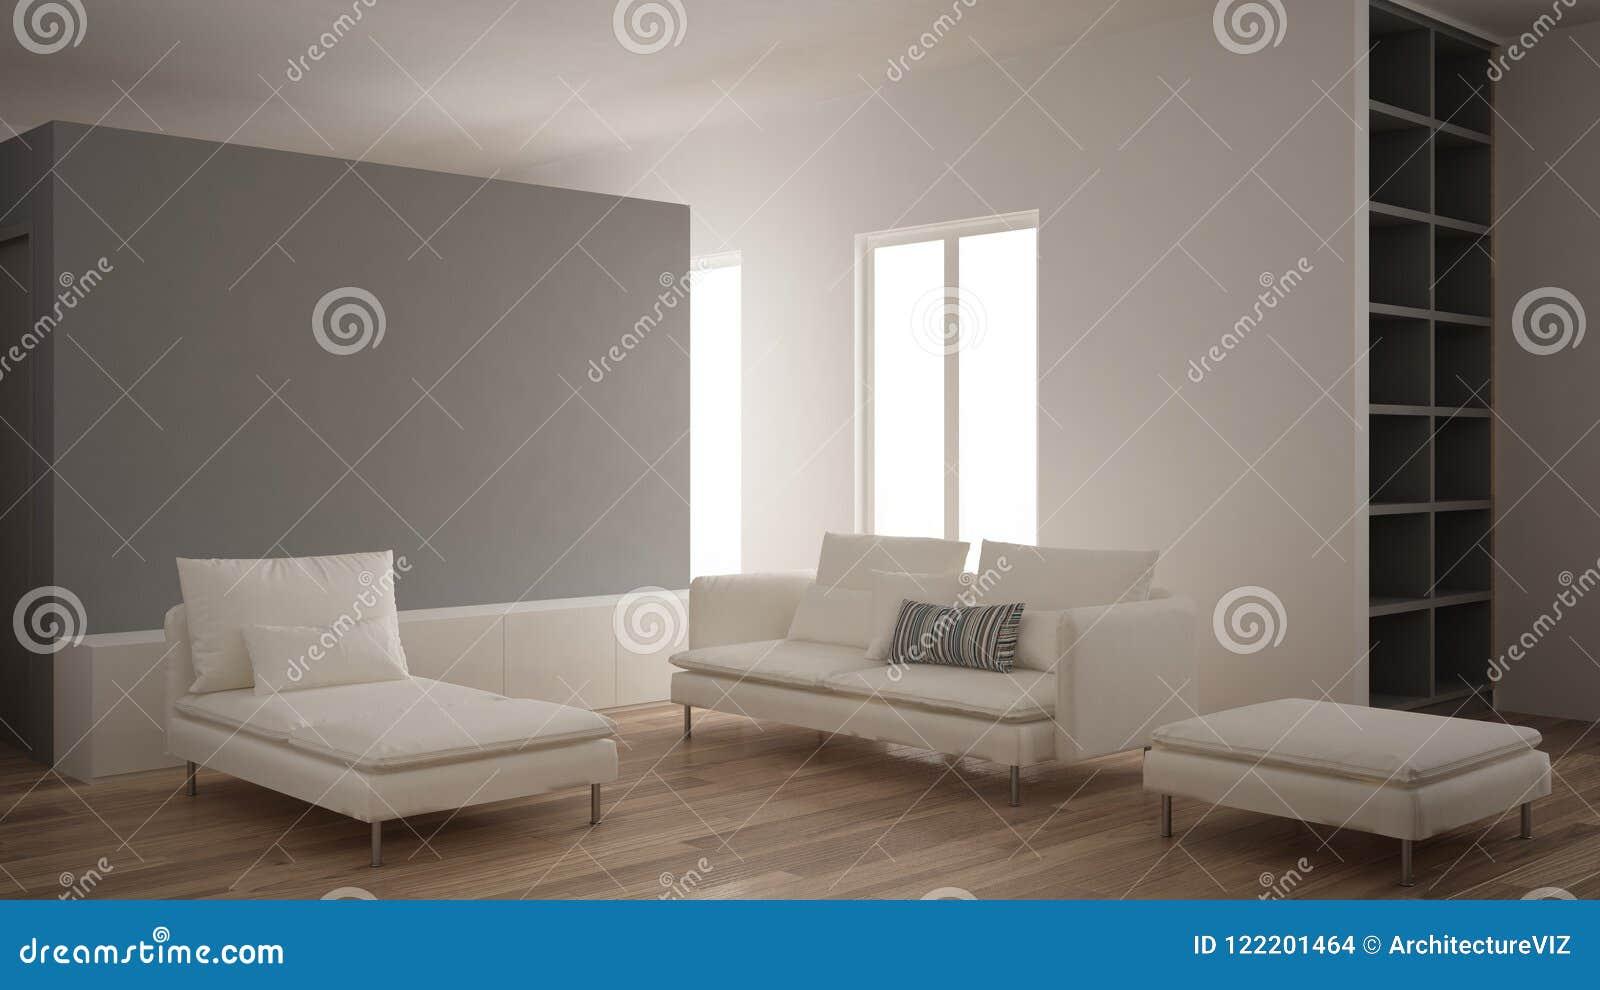 Minimalism Modern Living Room With Gray Plaster Wall Sofa